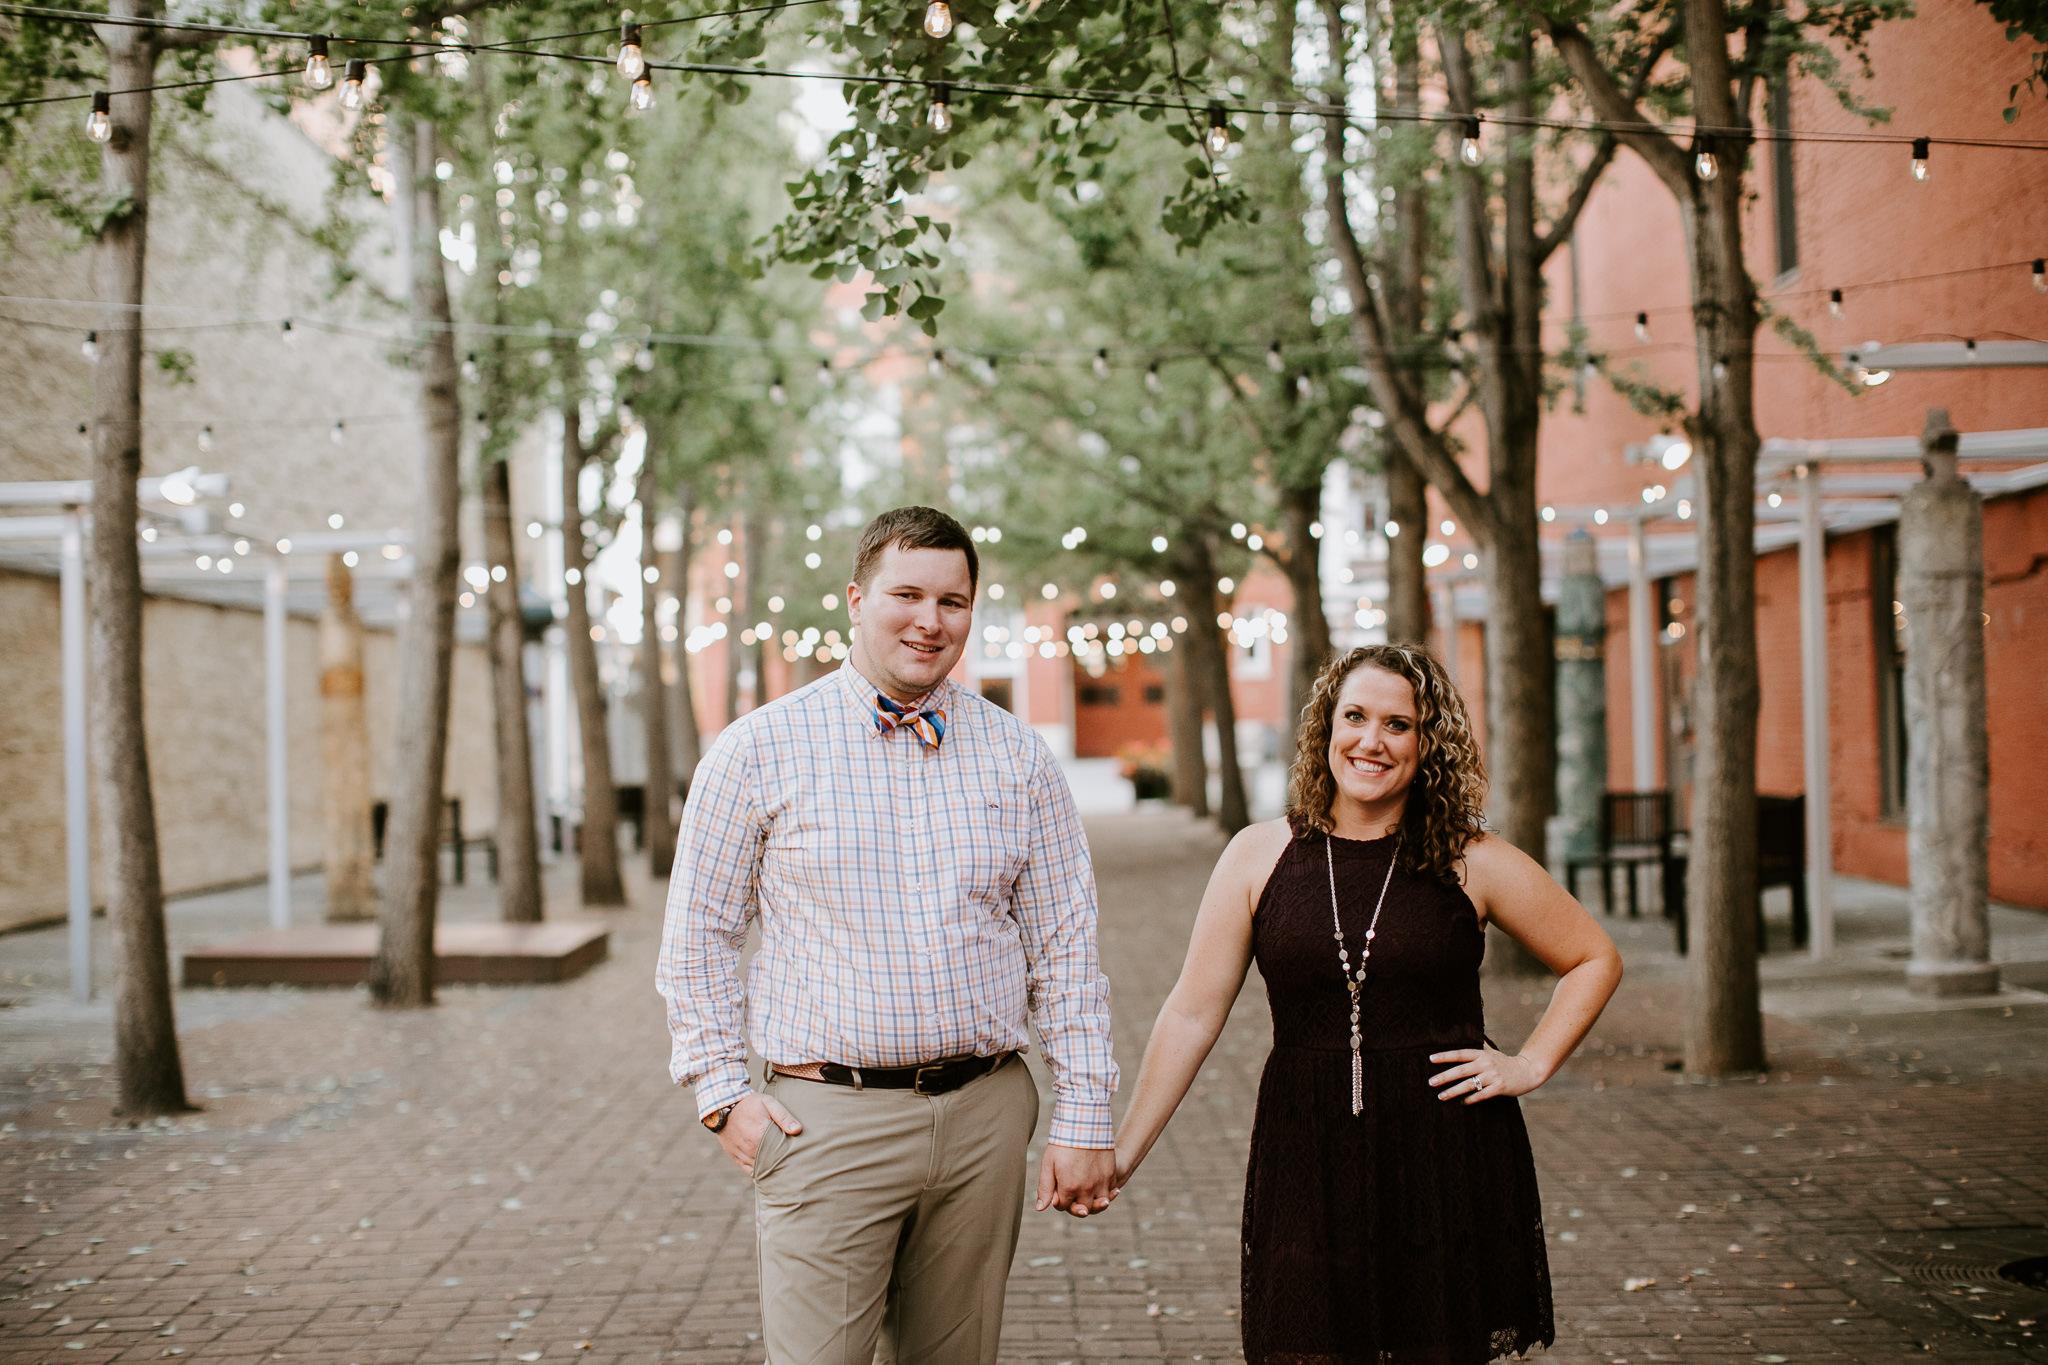 Roanoke - Engagement- Virginia wedding photographer - Pat Cori Photography-10.jpg